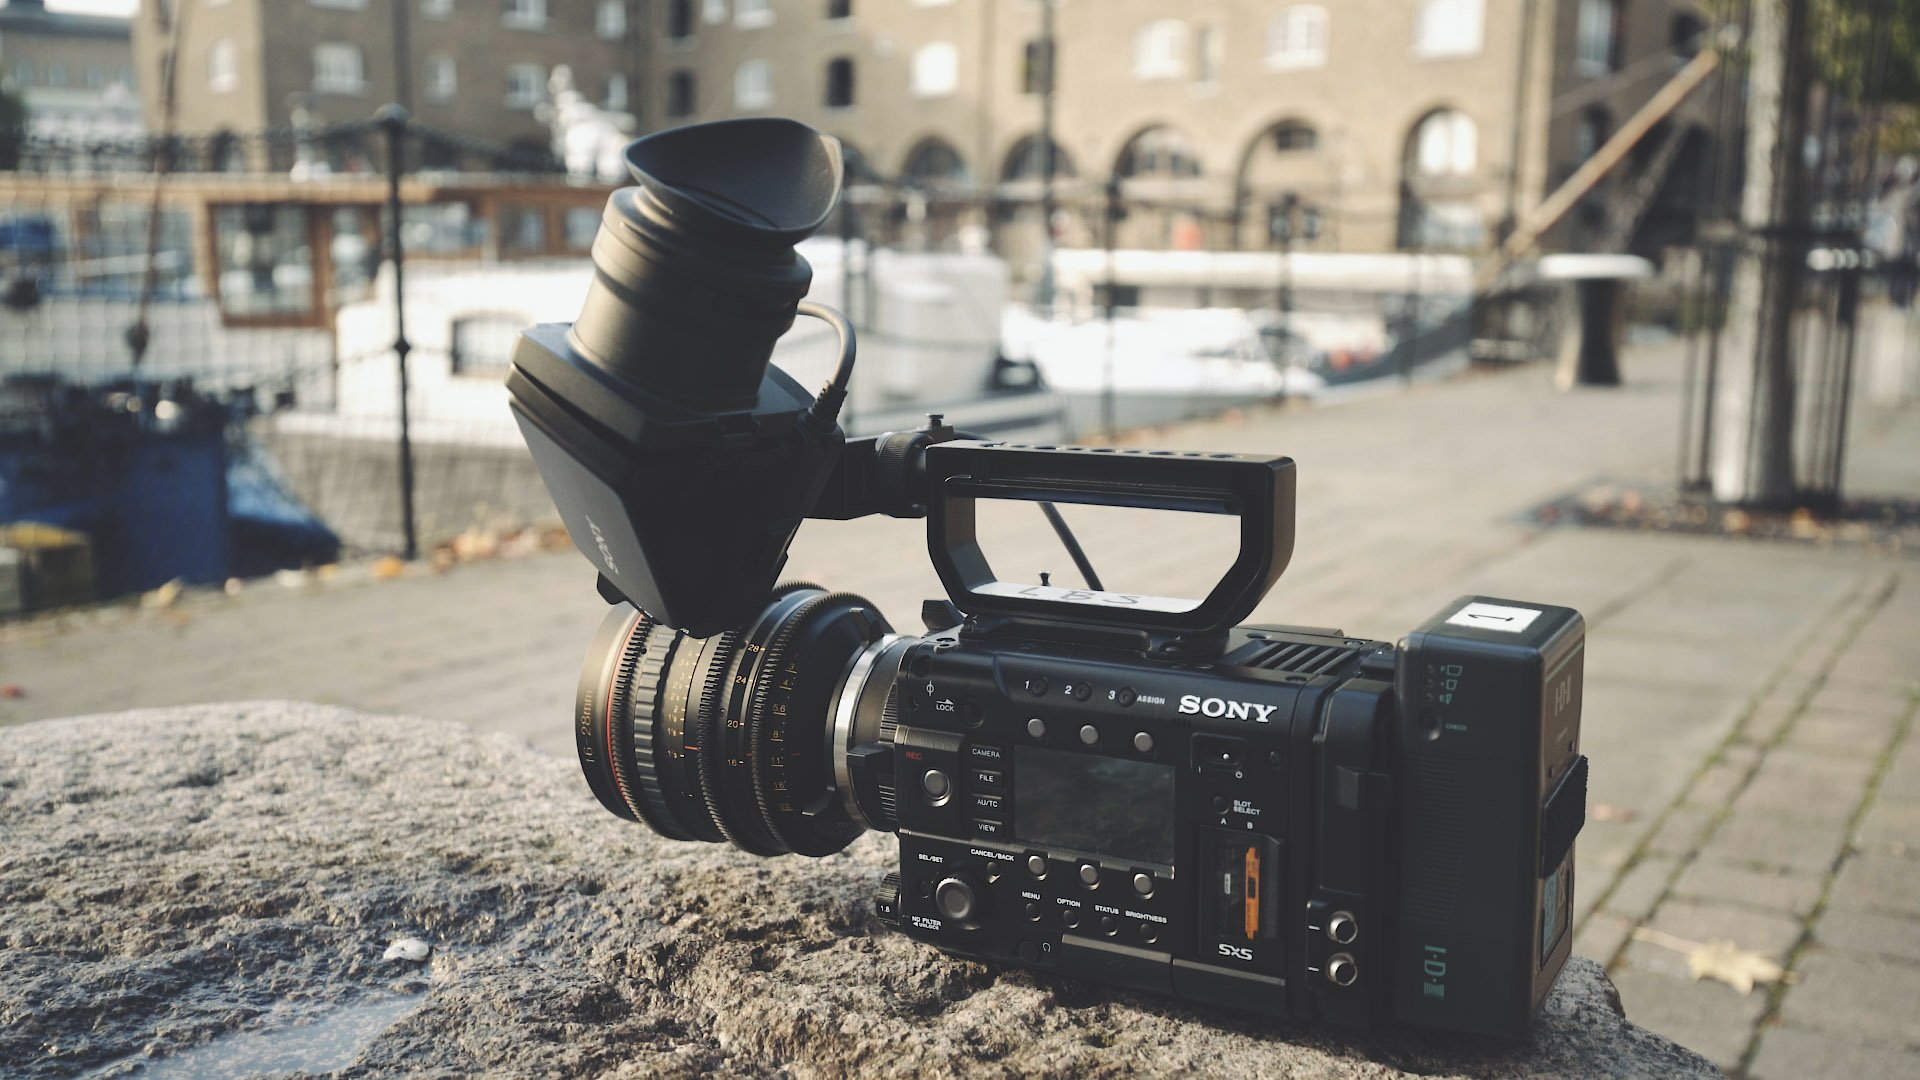 Sony F5 with Tokina Cine Lens